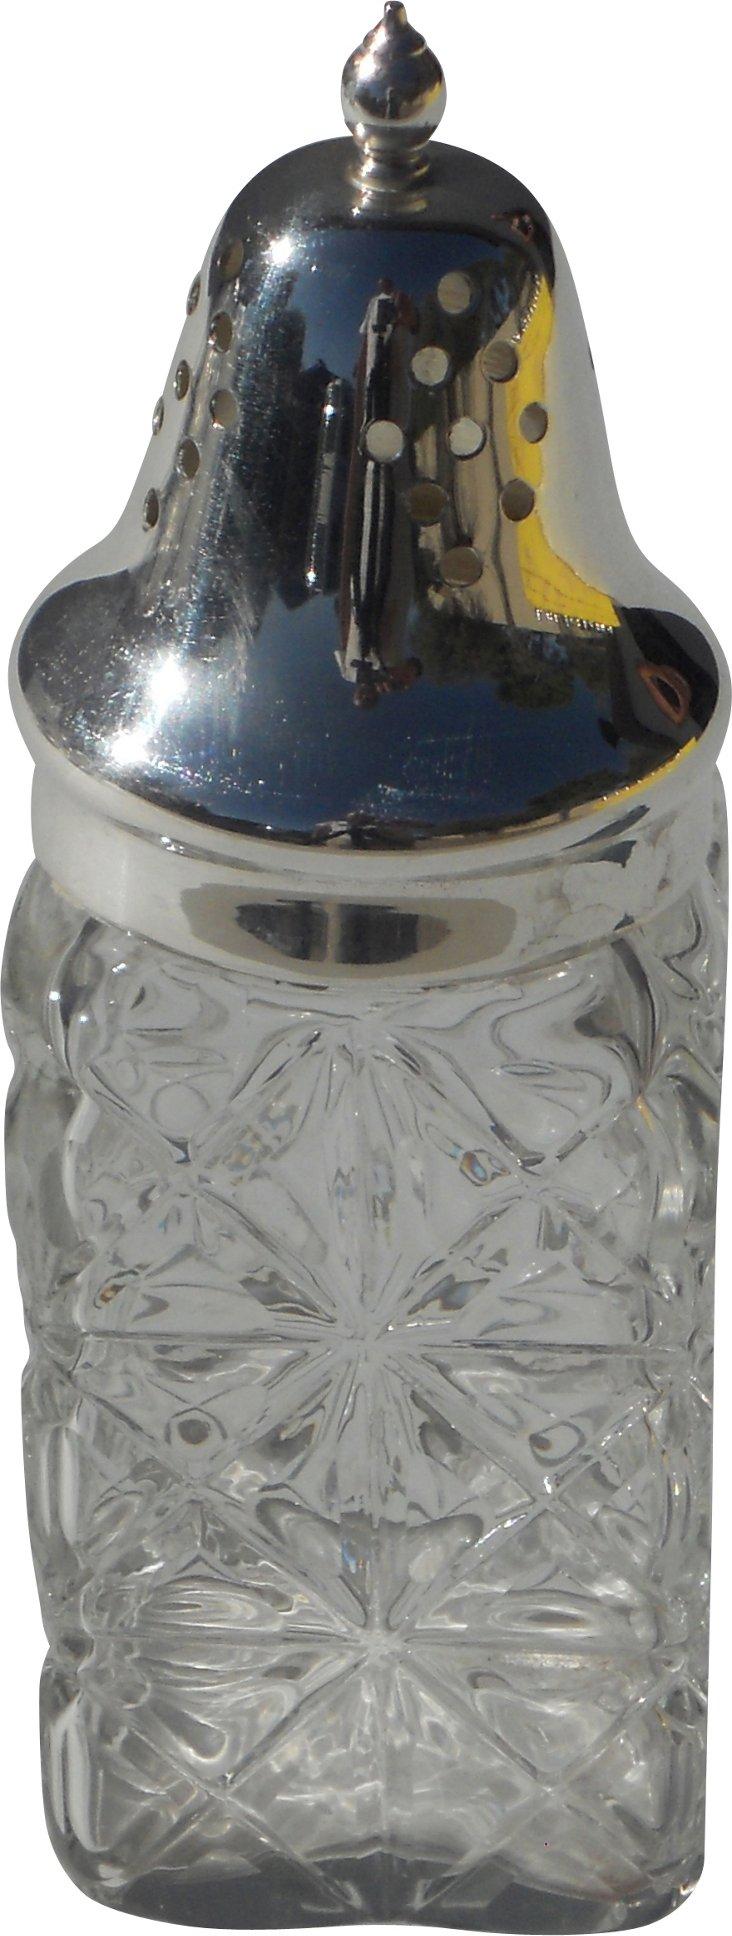 English Glass Sugar Shaker, C. 1890